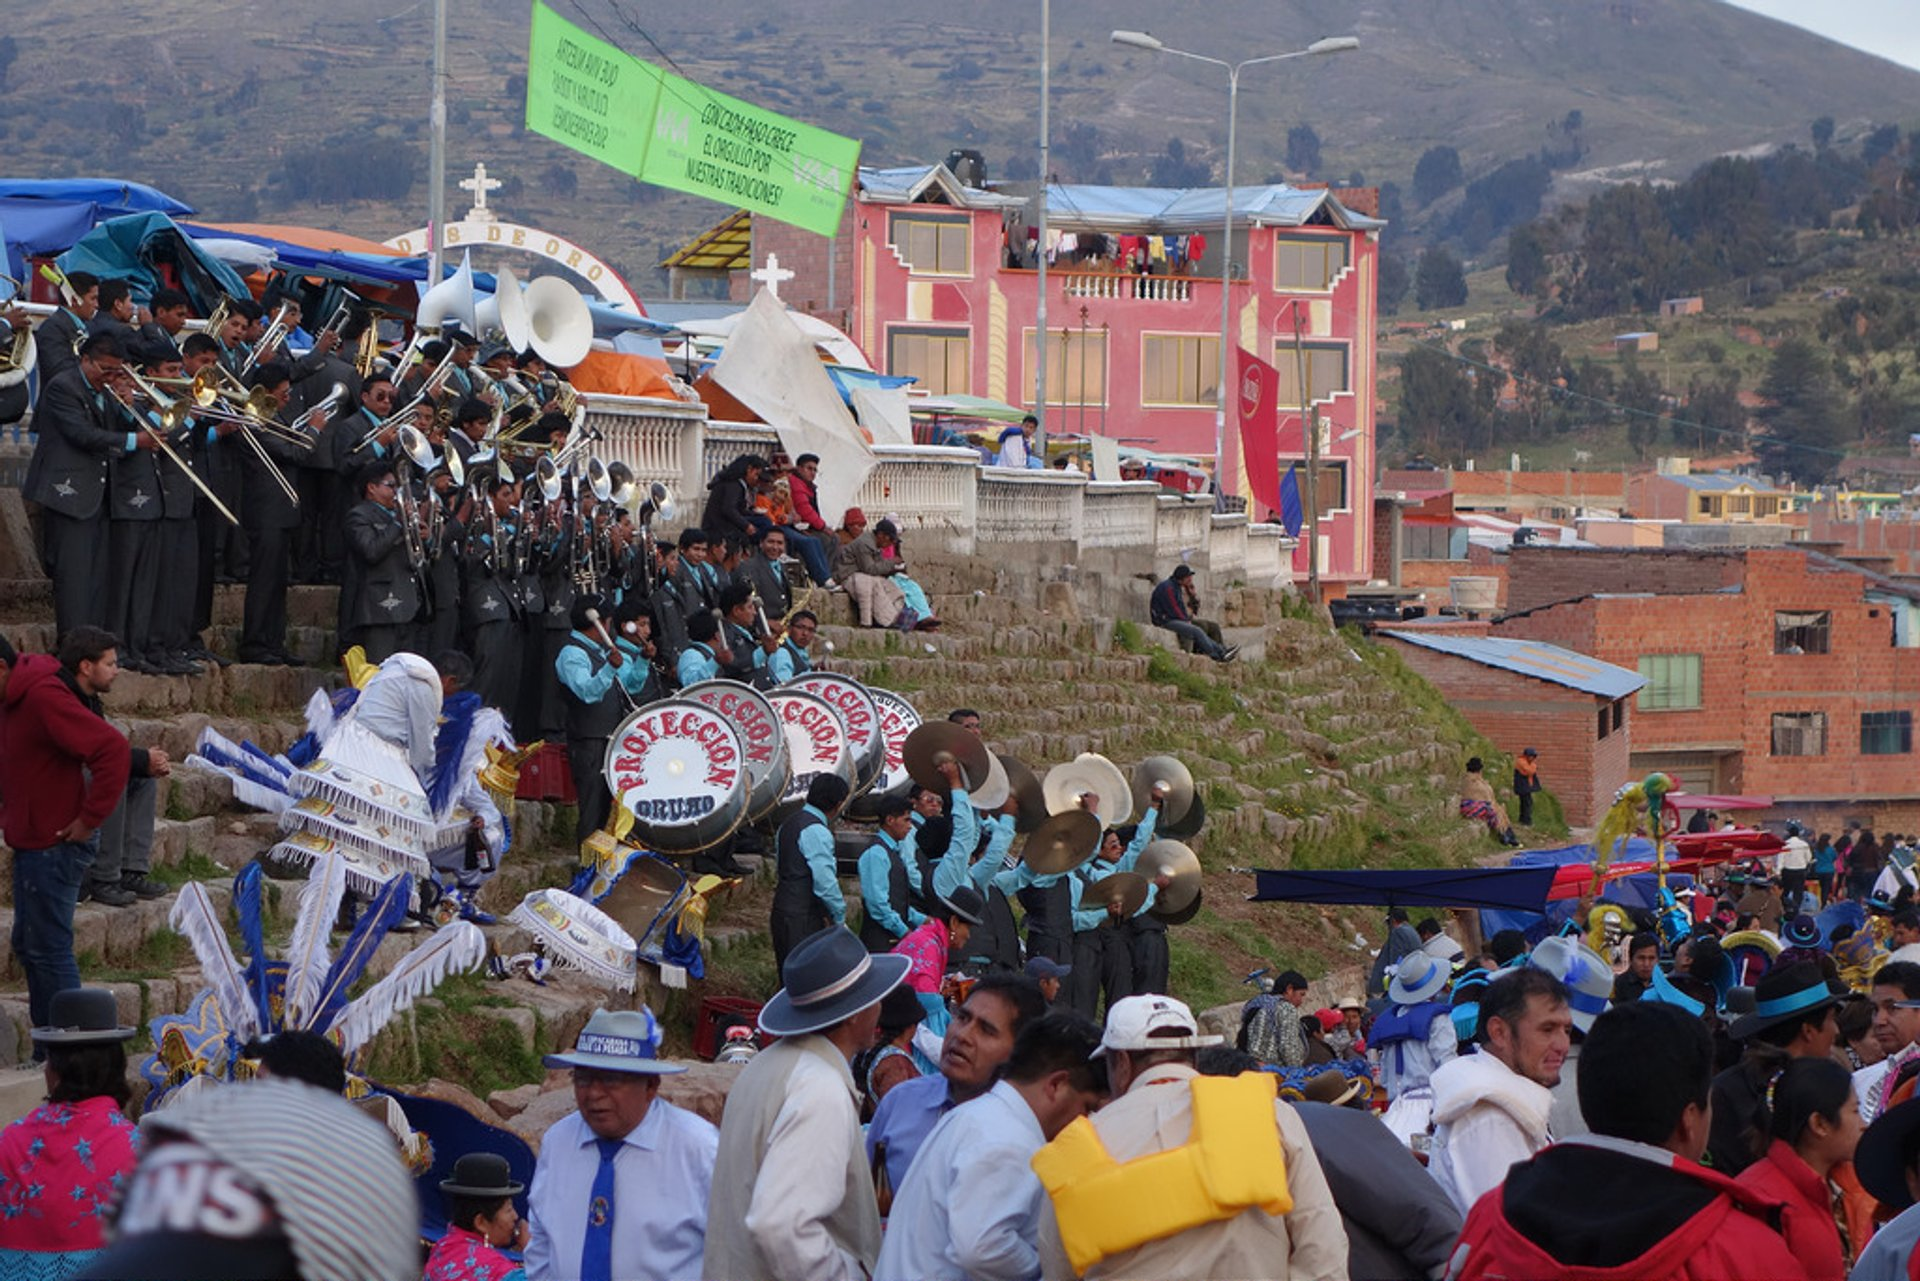 Best time for Fiesta de la Cruz in Bolivia 2019